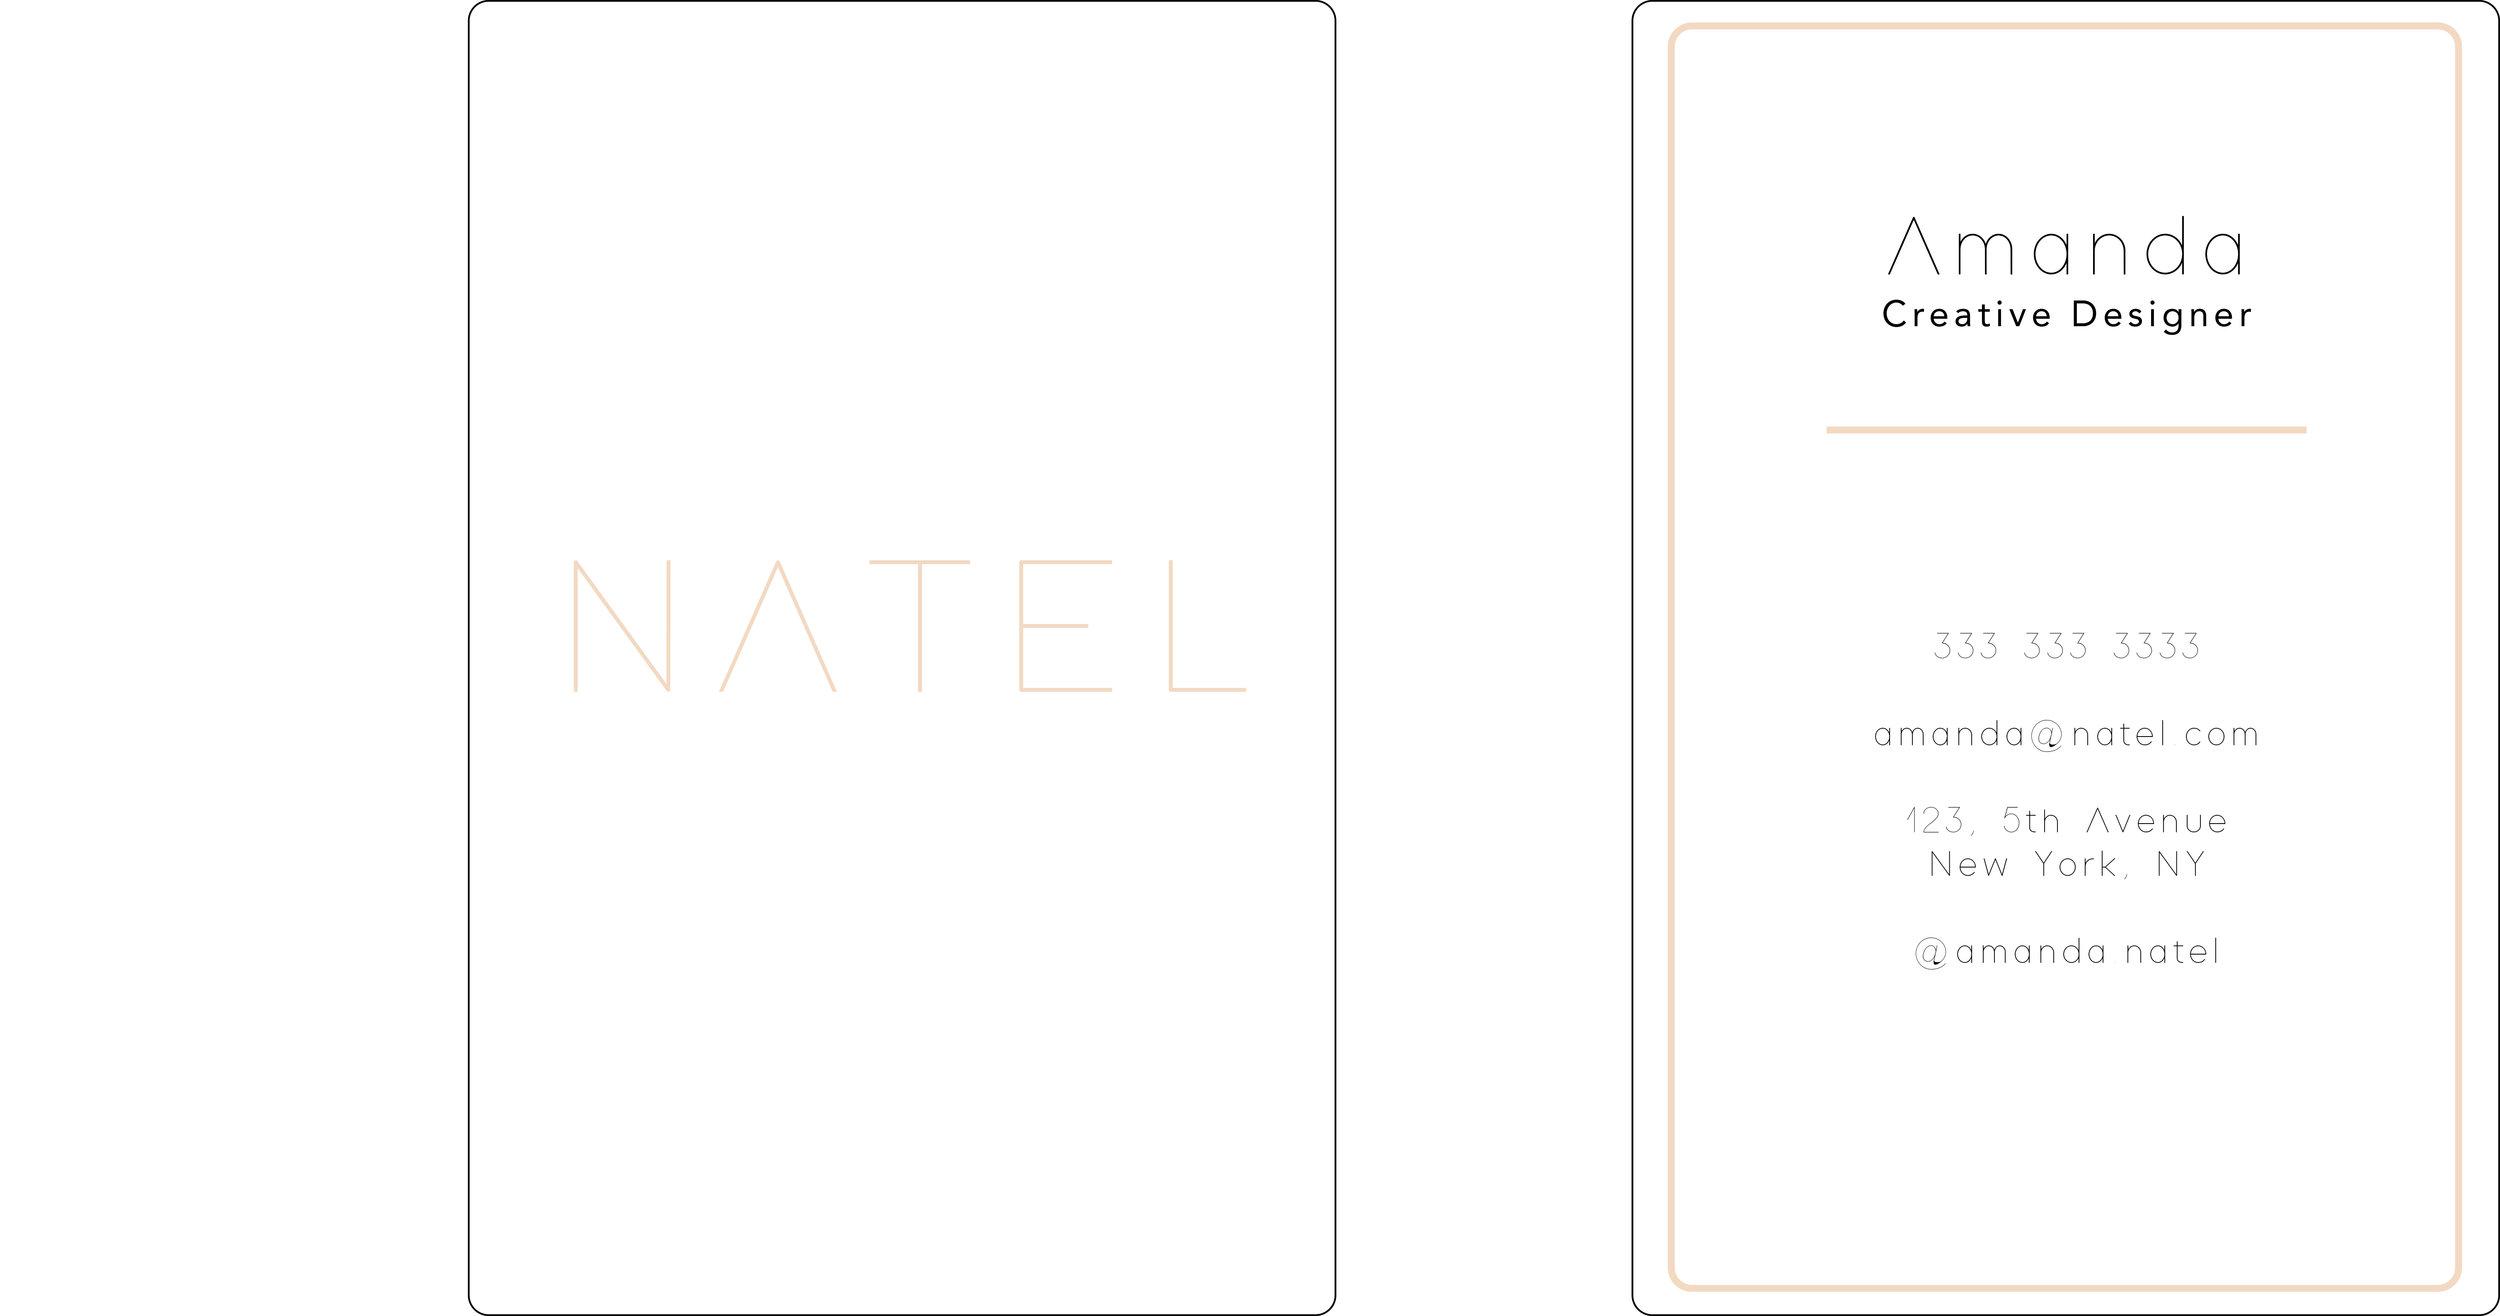 Nawal Portfolio Branding P 2 business card.jpg